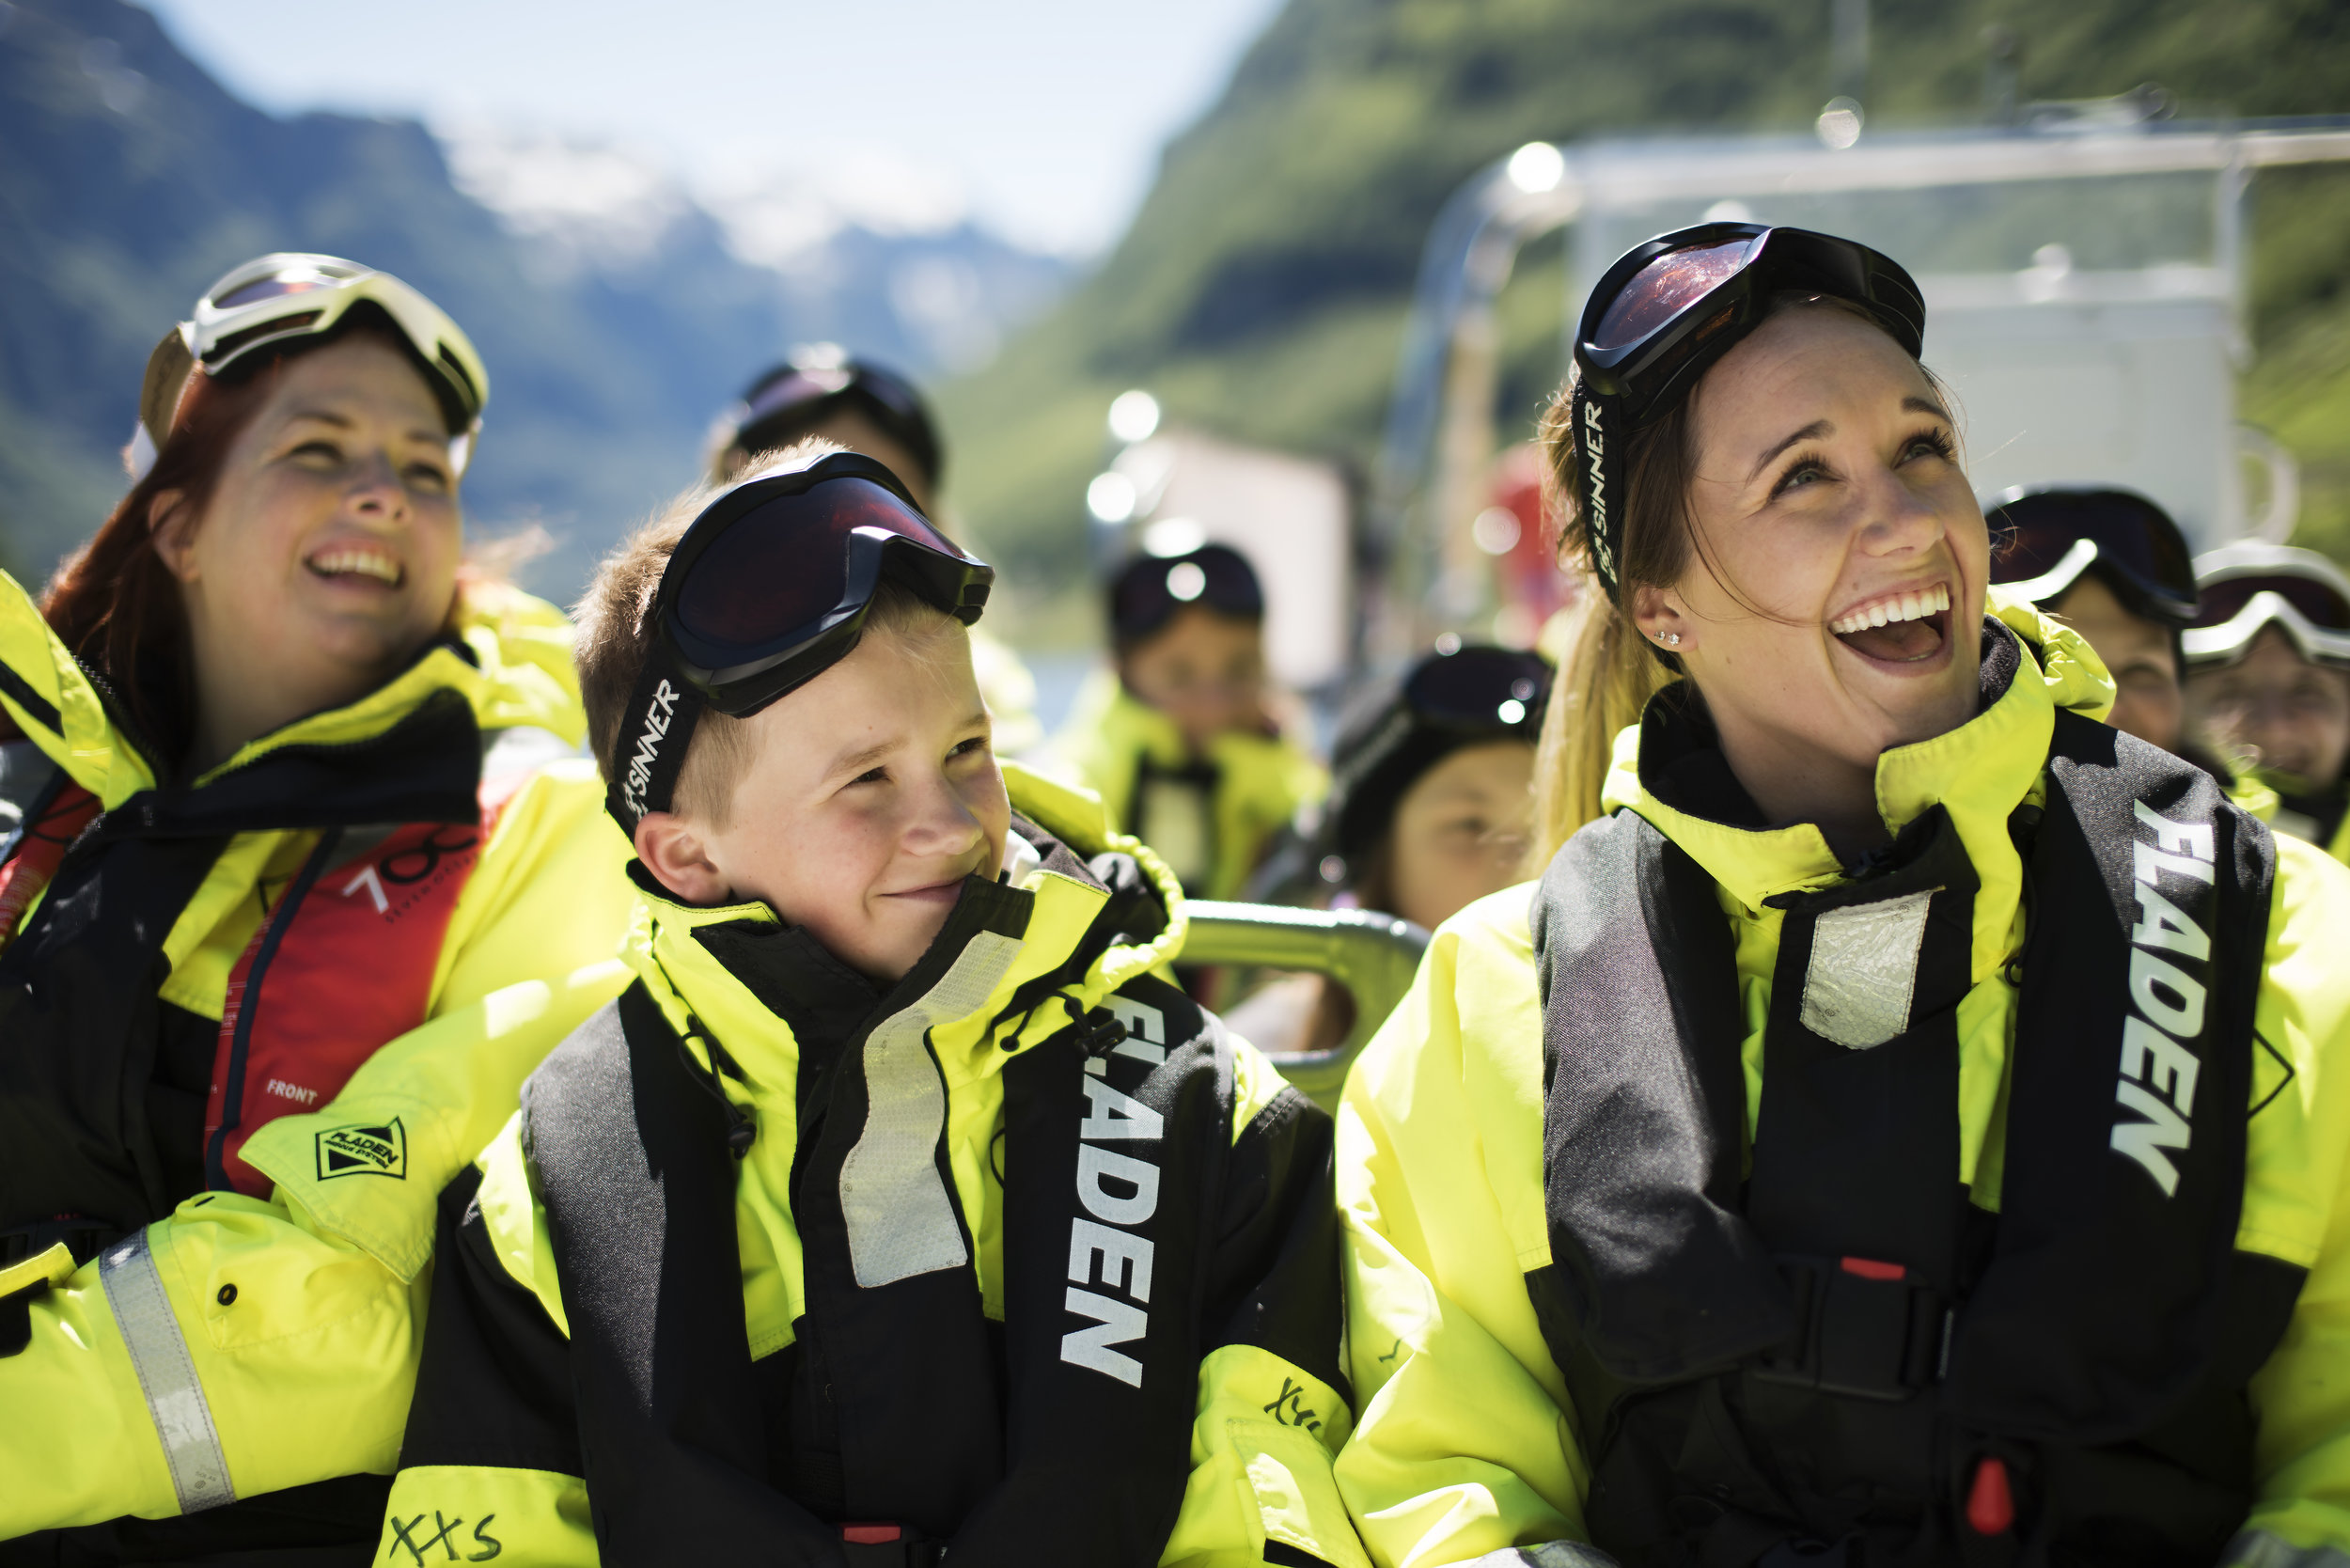 practical information - Time/period: 1 hour and 30 min. (Flåm - Sagfossen - Flåm)June 1st. 2019 - August 31st. 2019Departure at 09:00 - 10:30, 10:00 - 11:30 og 15:00 - 16:30.Meet: 20 minutes prior to departure in FjordSafari receptionPrice: Adults NOK 710,- / Children NOK 530,- (free for children below 4)